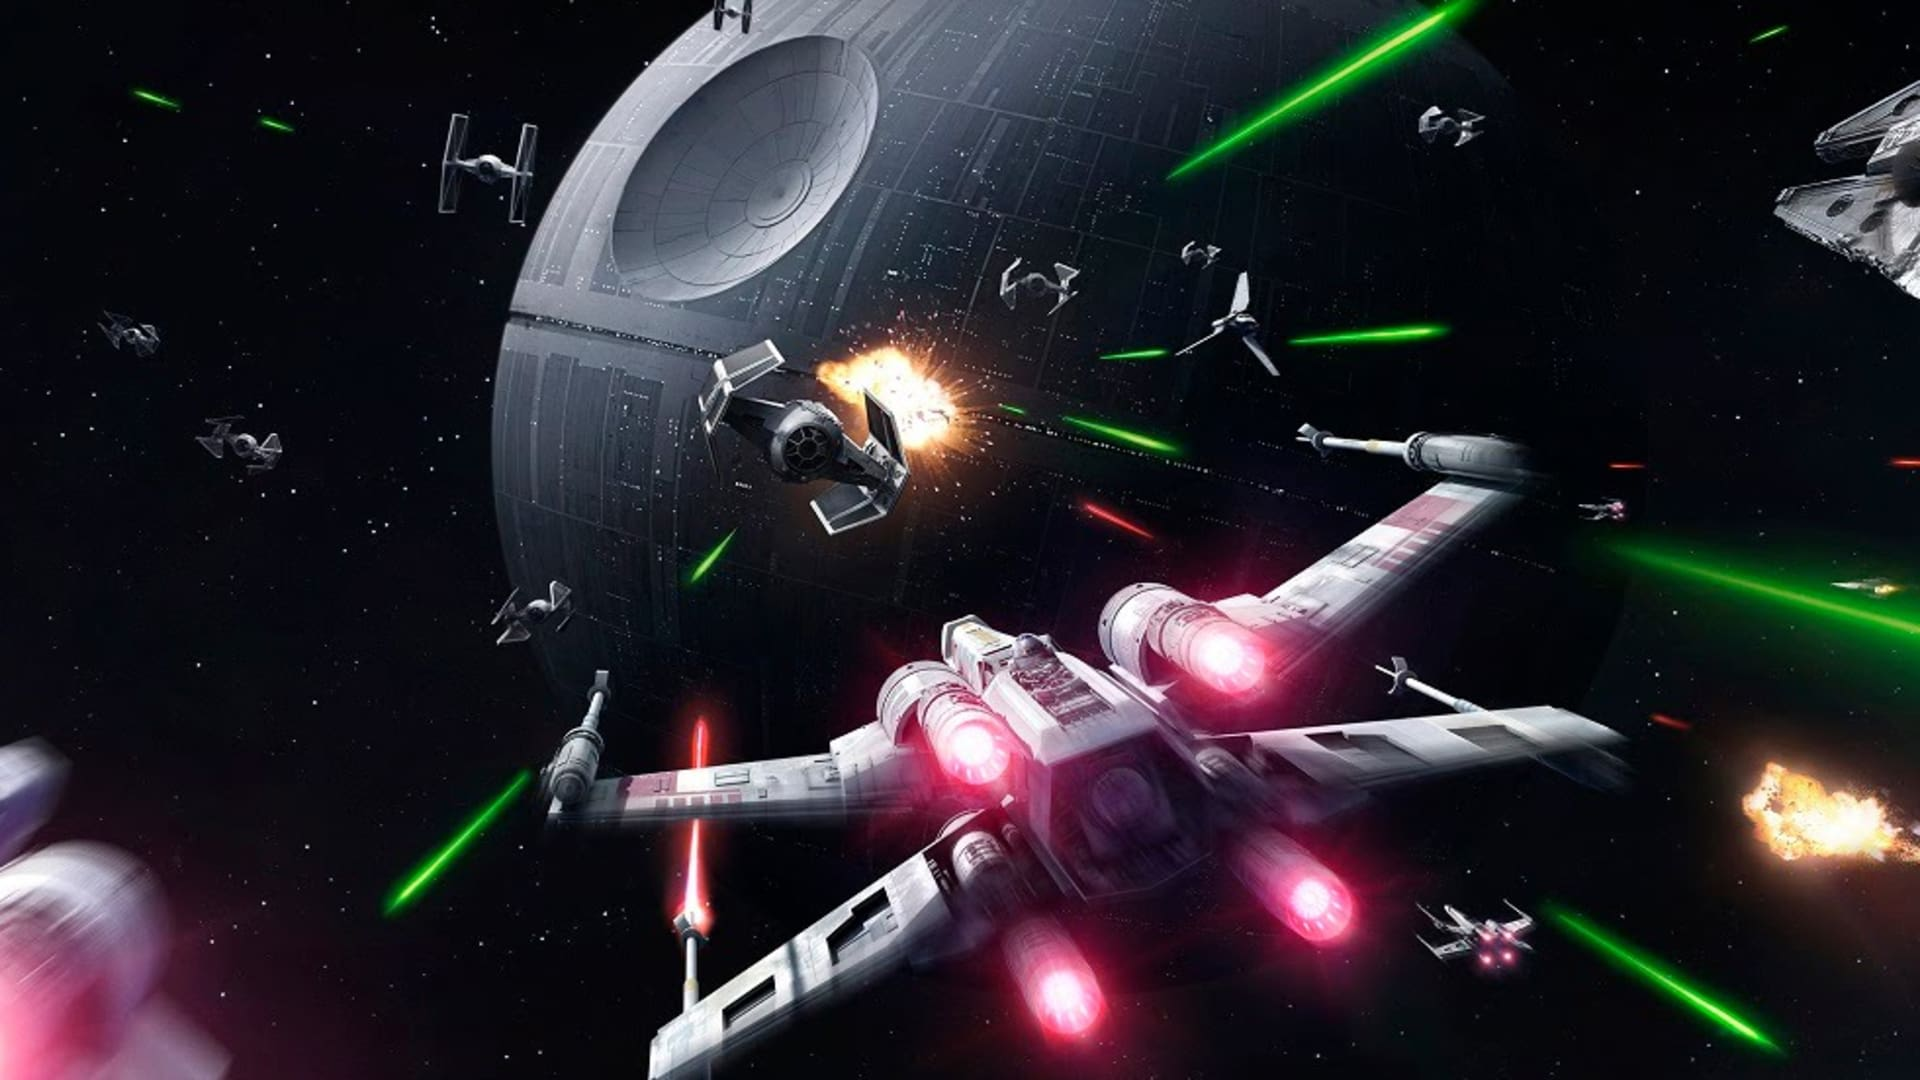 Spela gratis Death Star i Battlefront i helgen